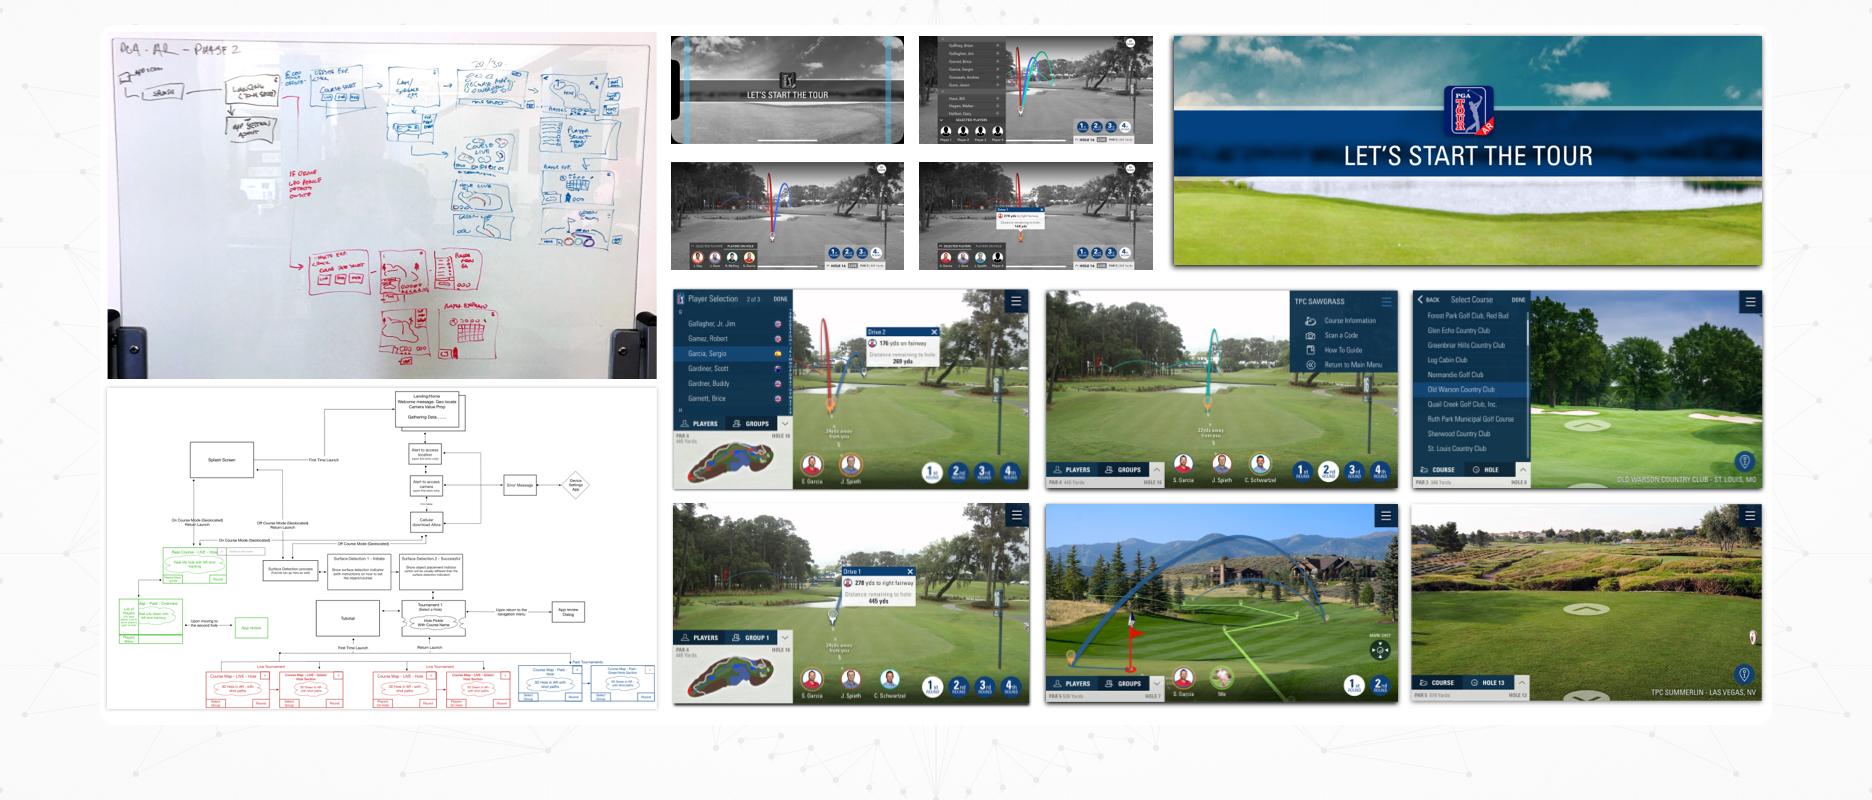 PGA TOUR AR - Case Study Image - Concept Design